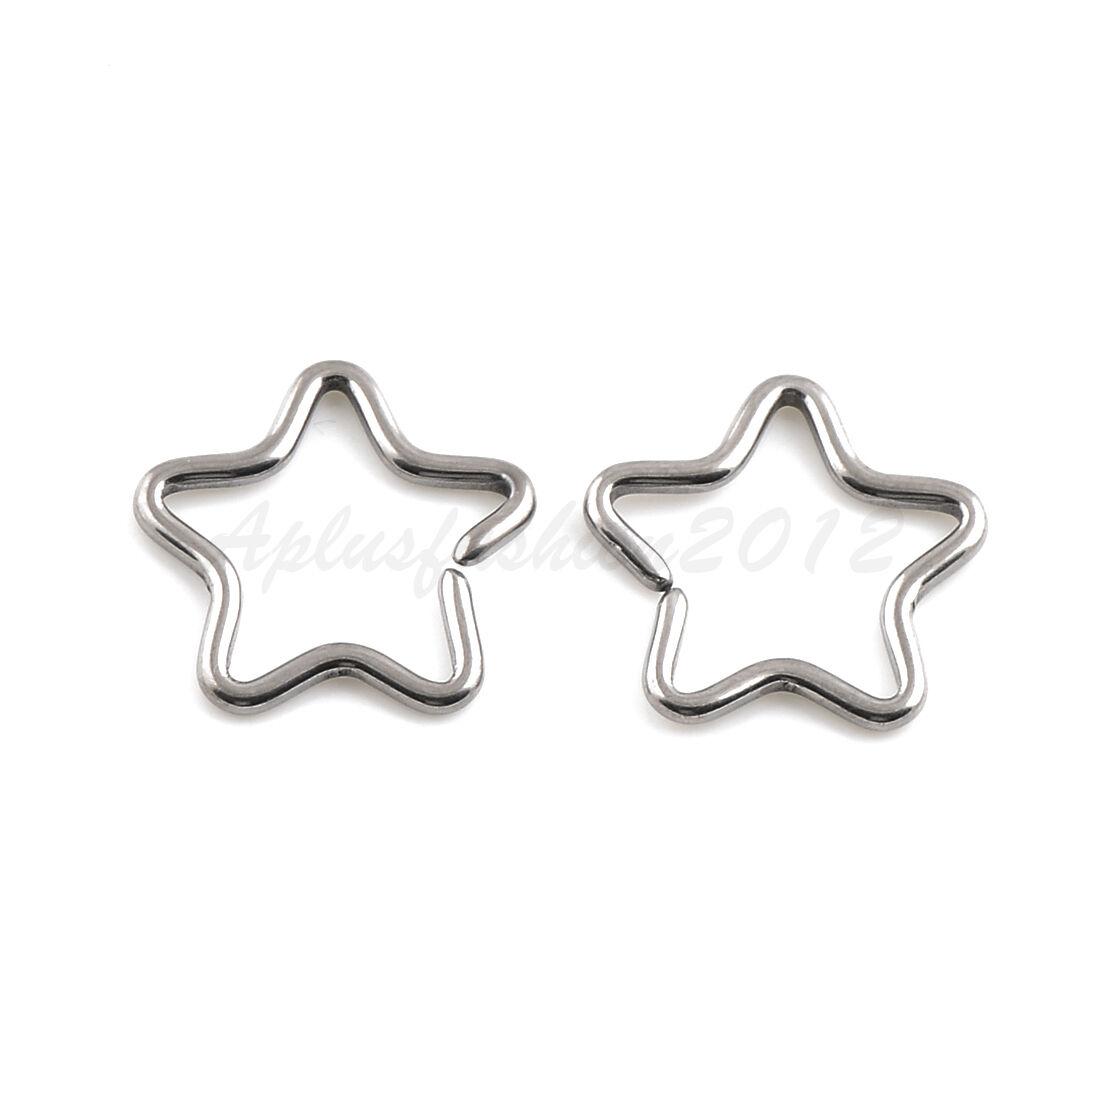 16G Titanium Star Shaped Ear Cartilage Daith Orbital Piercing Rings Stainless